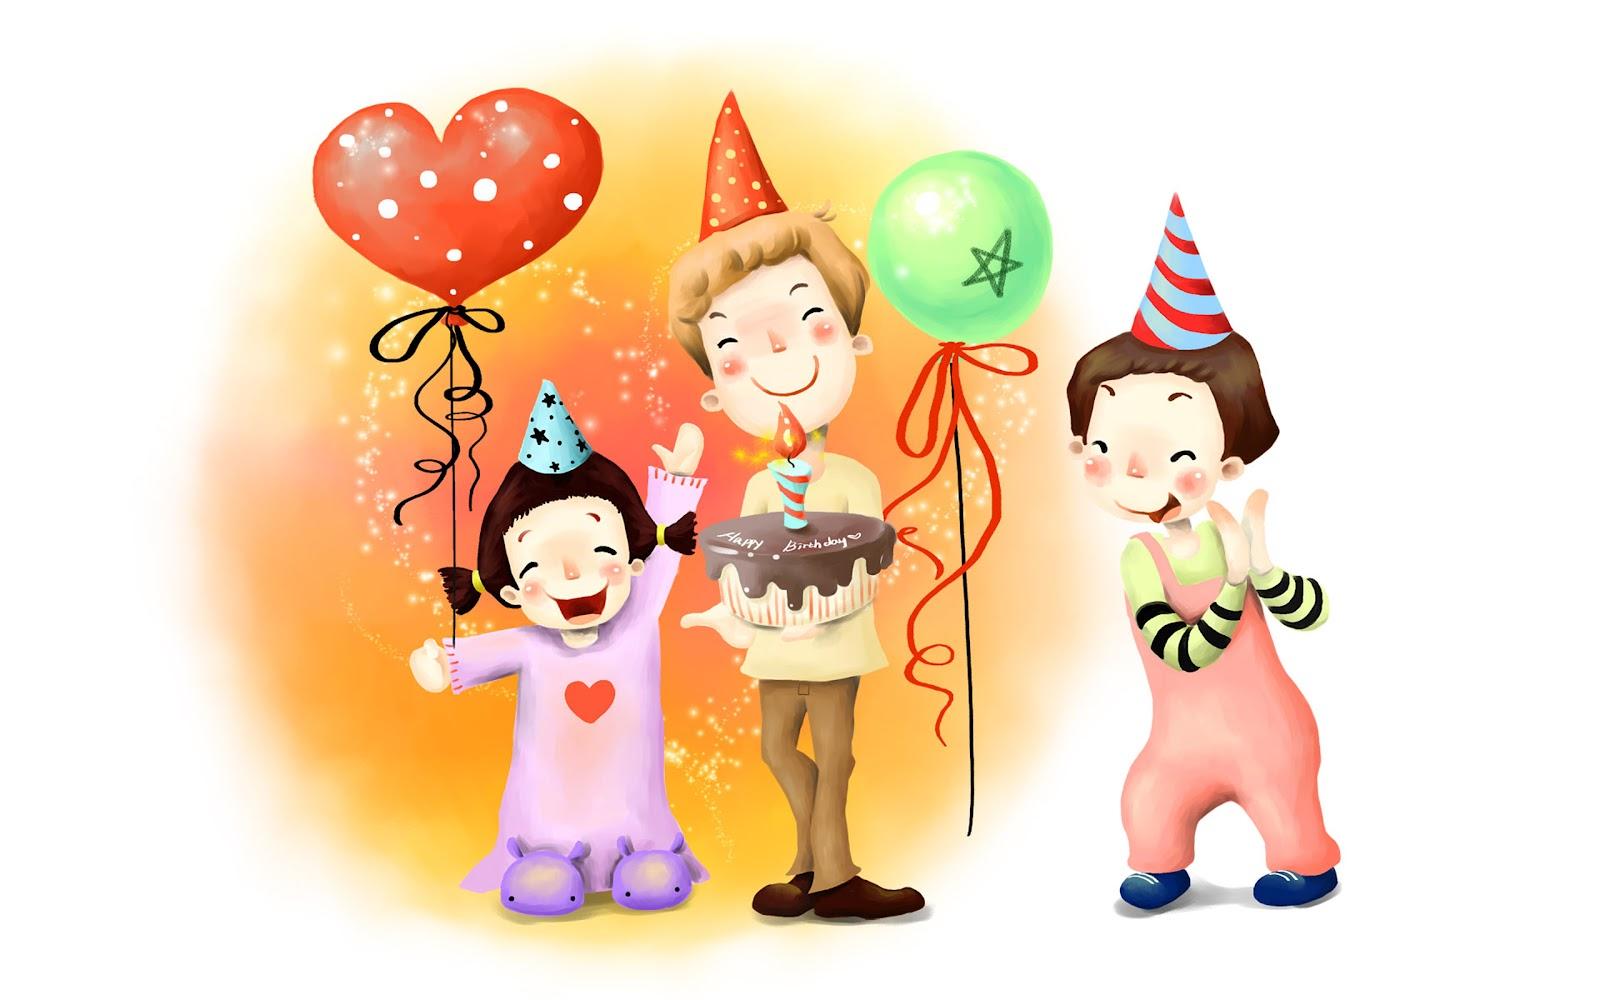 Wallpaper Gallery Happy Birthday Wallpaper   6 1600x1000